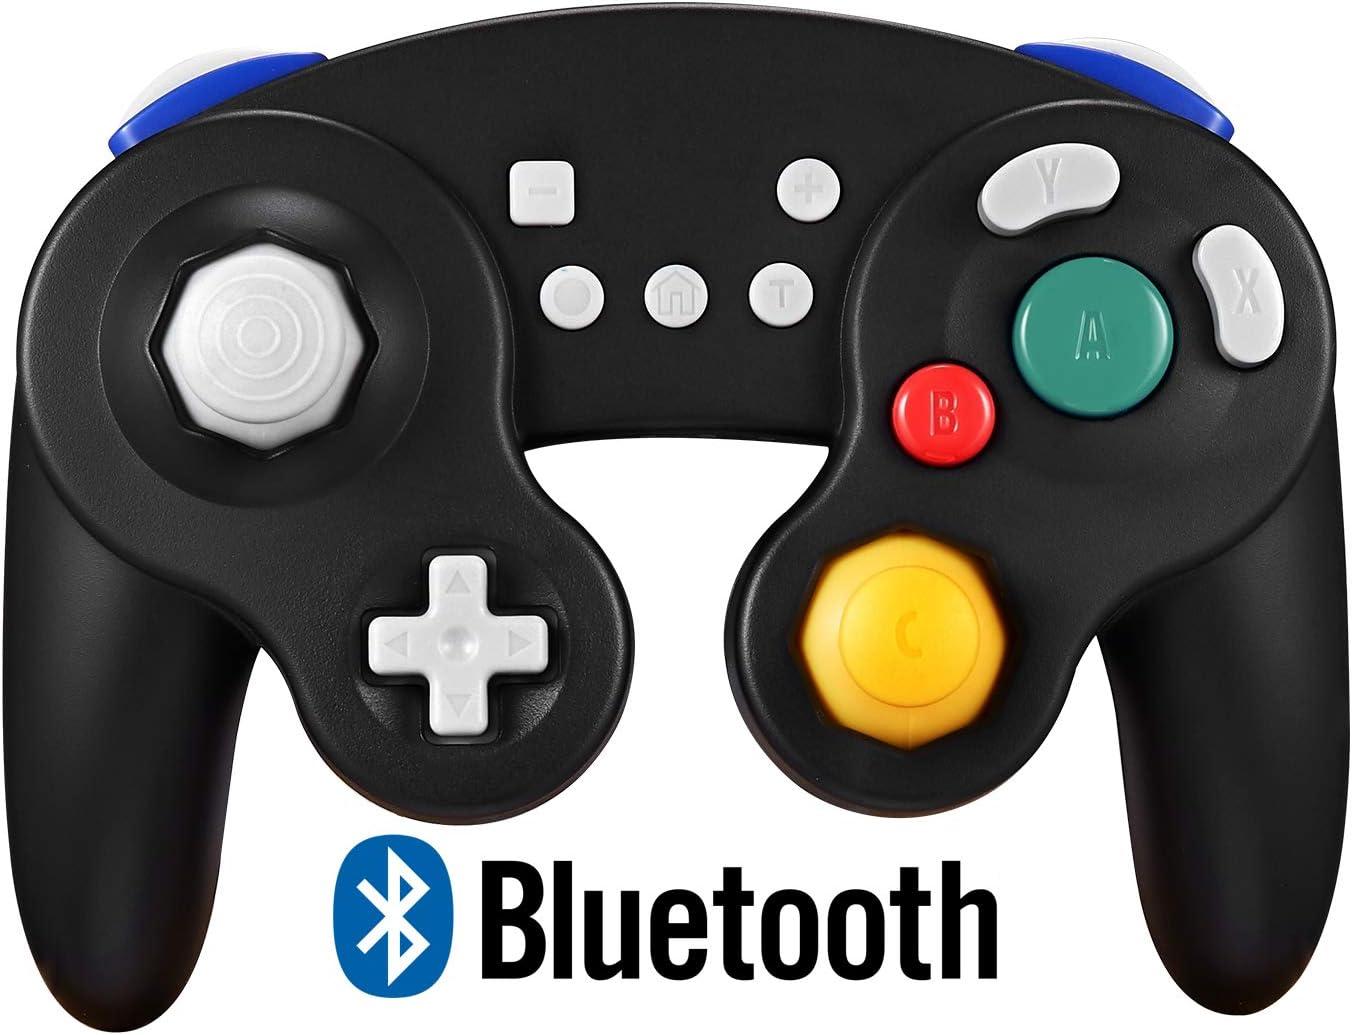 Exlene Wireless Controller Gamepad para Nintendo Switch, Recargable, Compatible con PC / PS3, GameCube Estilo, Motion Controls, Rumble, Turbo (Negro): Amazon.es: Videojuegos